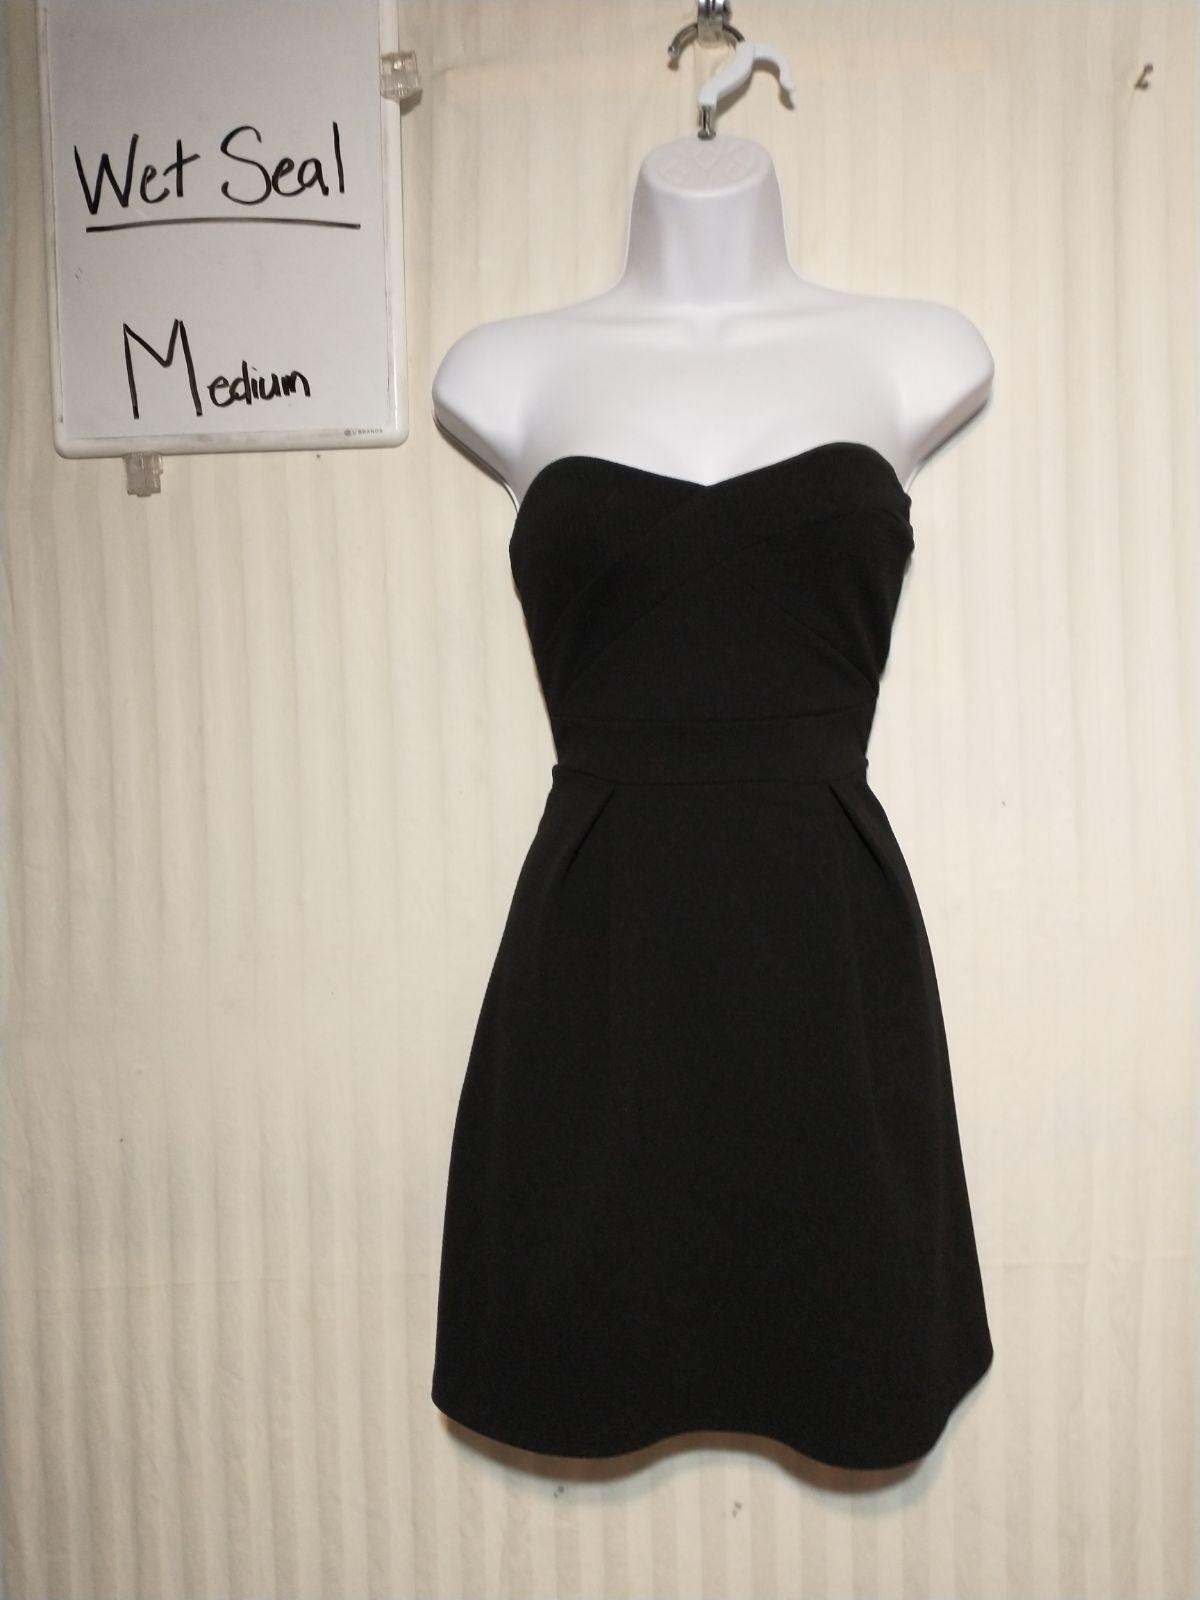 Wet seal strapless black mini dress medi